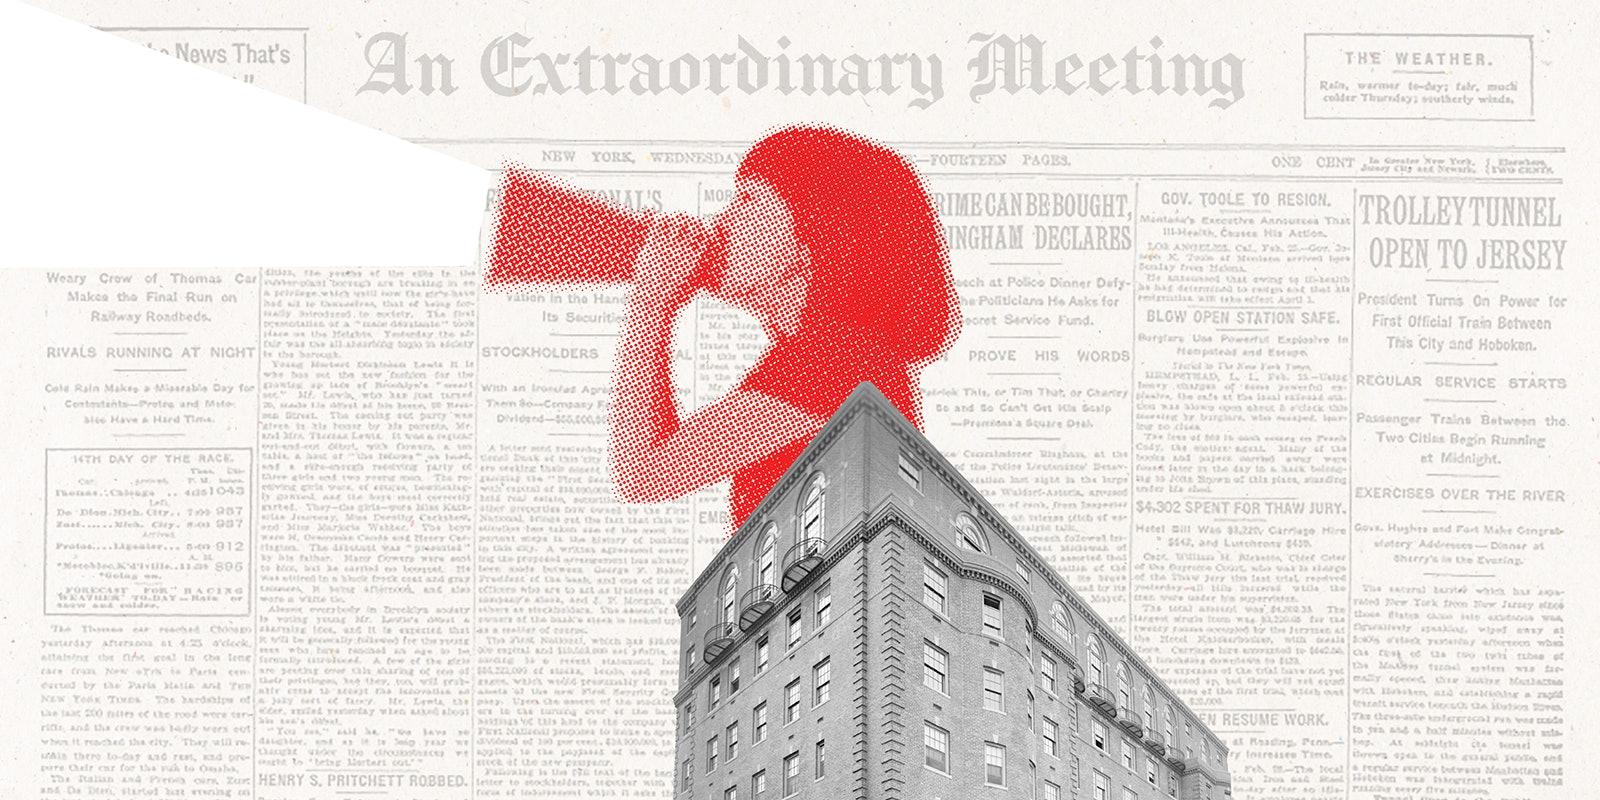 An Extraordinary Meeting